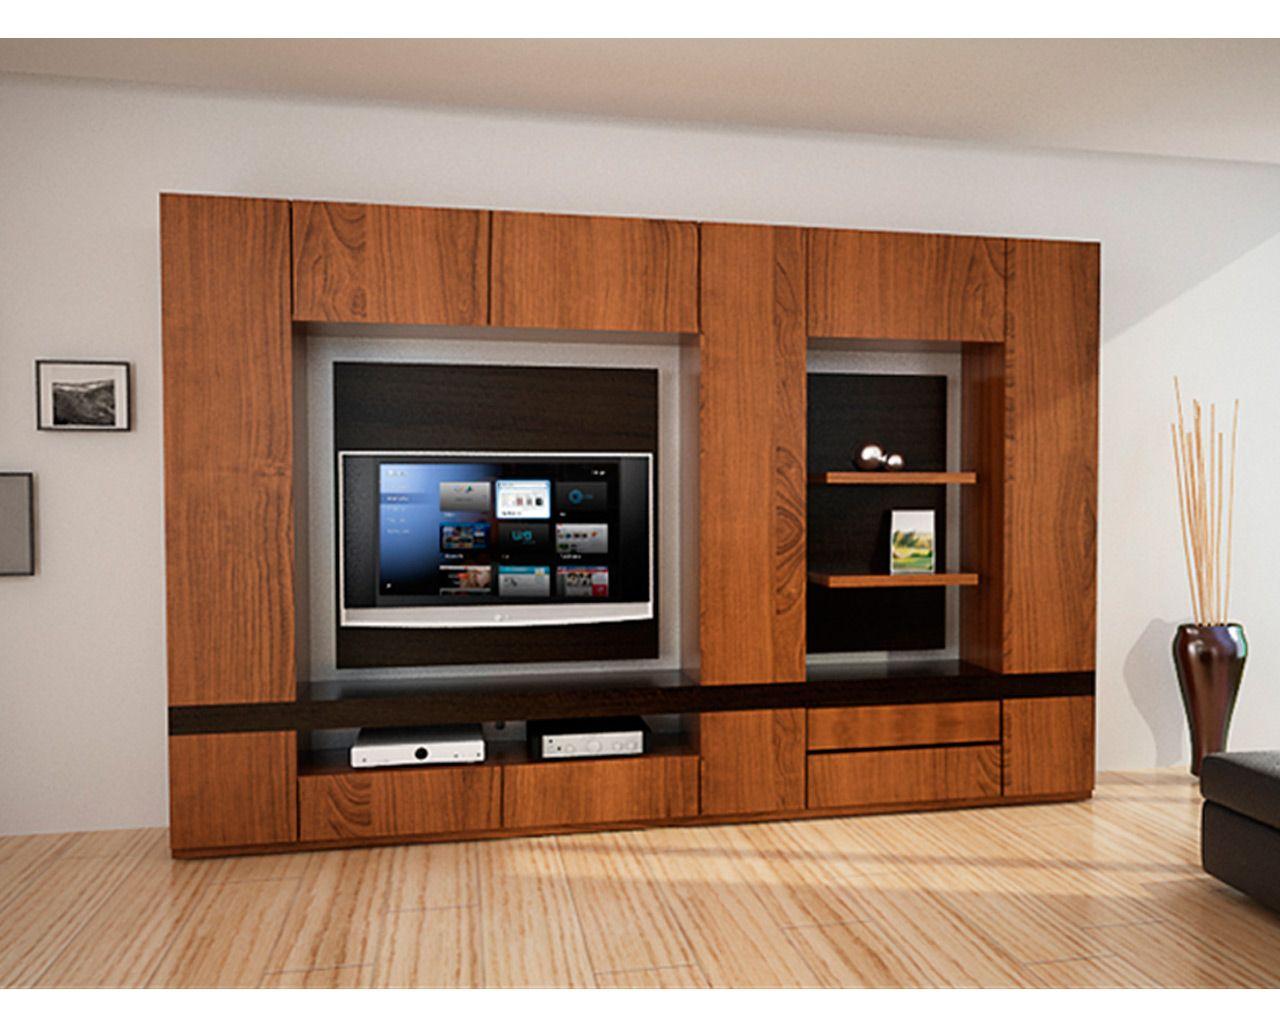 Centro De Entretenimiento Hilef Moderno Mueble Muderno De  # Muebles Centro De Entretenimiento Moderno